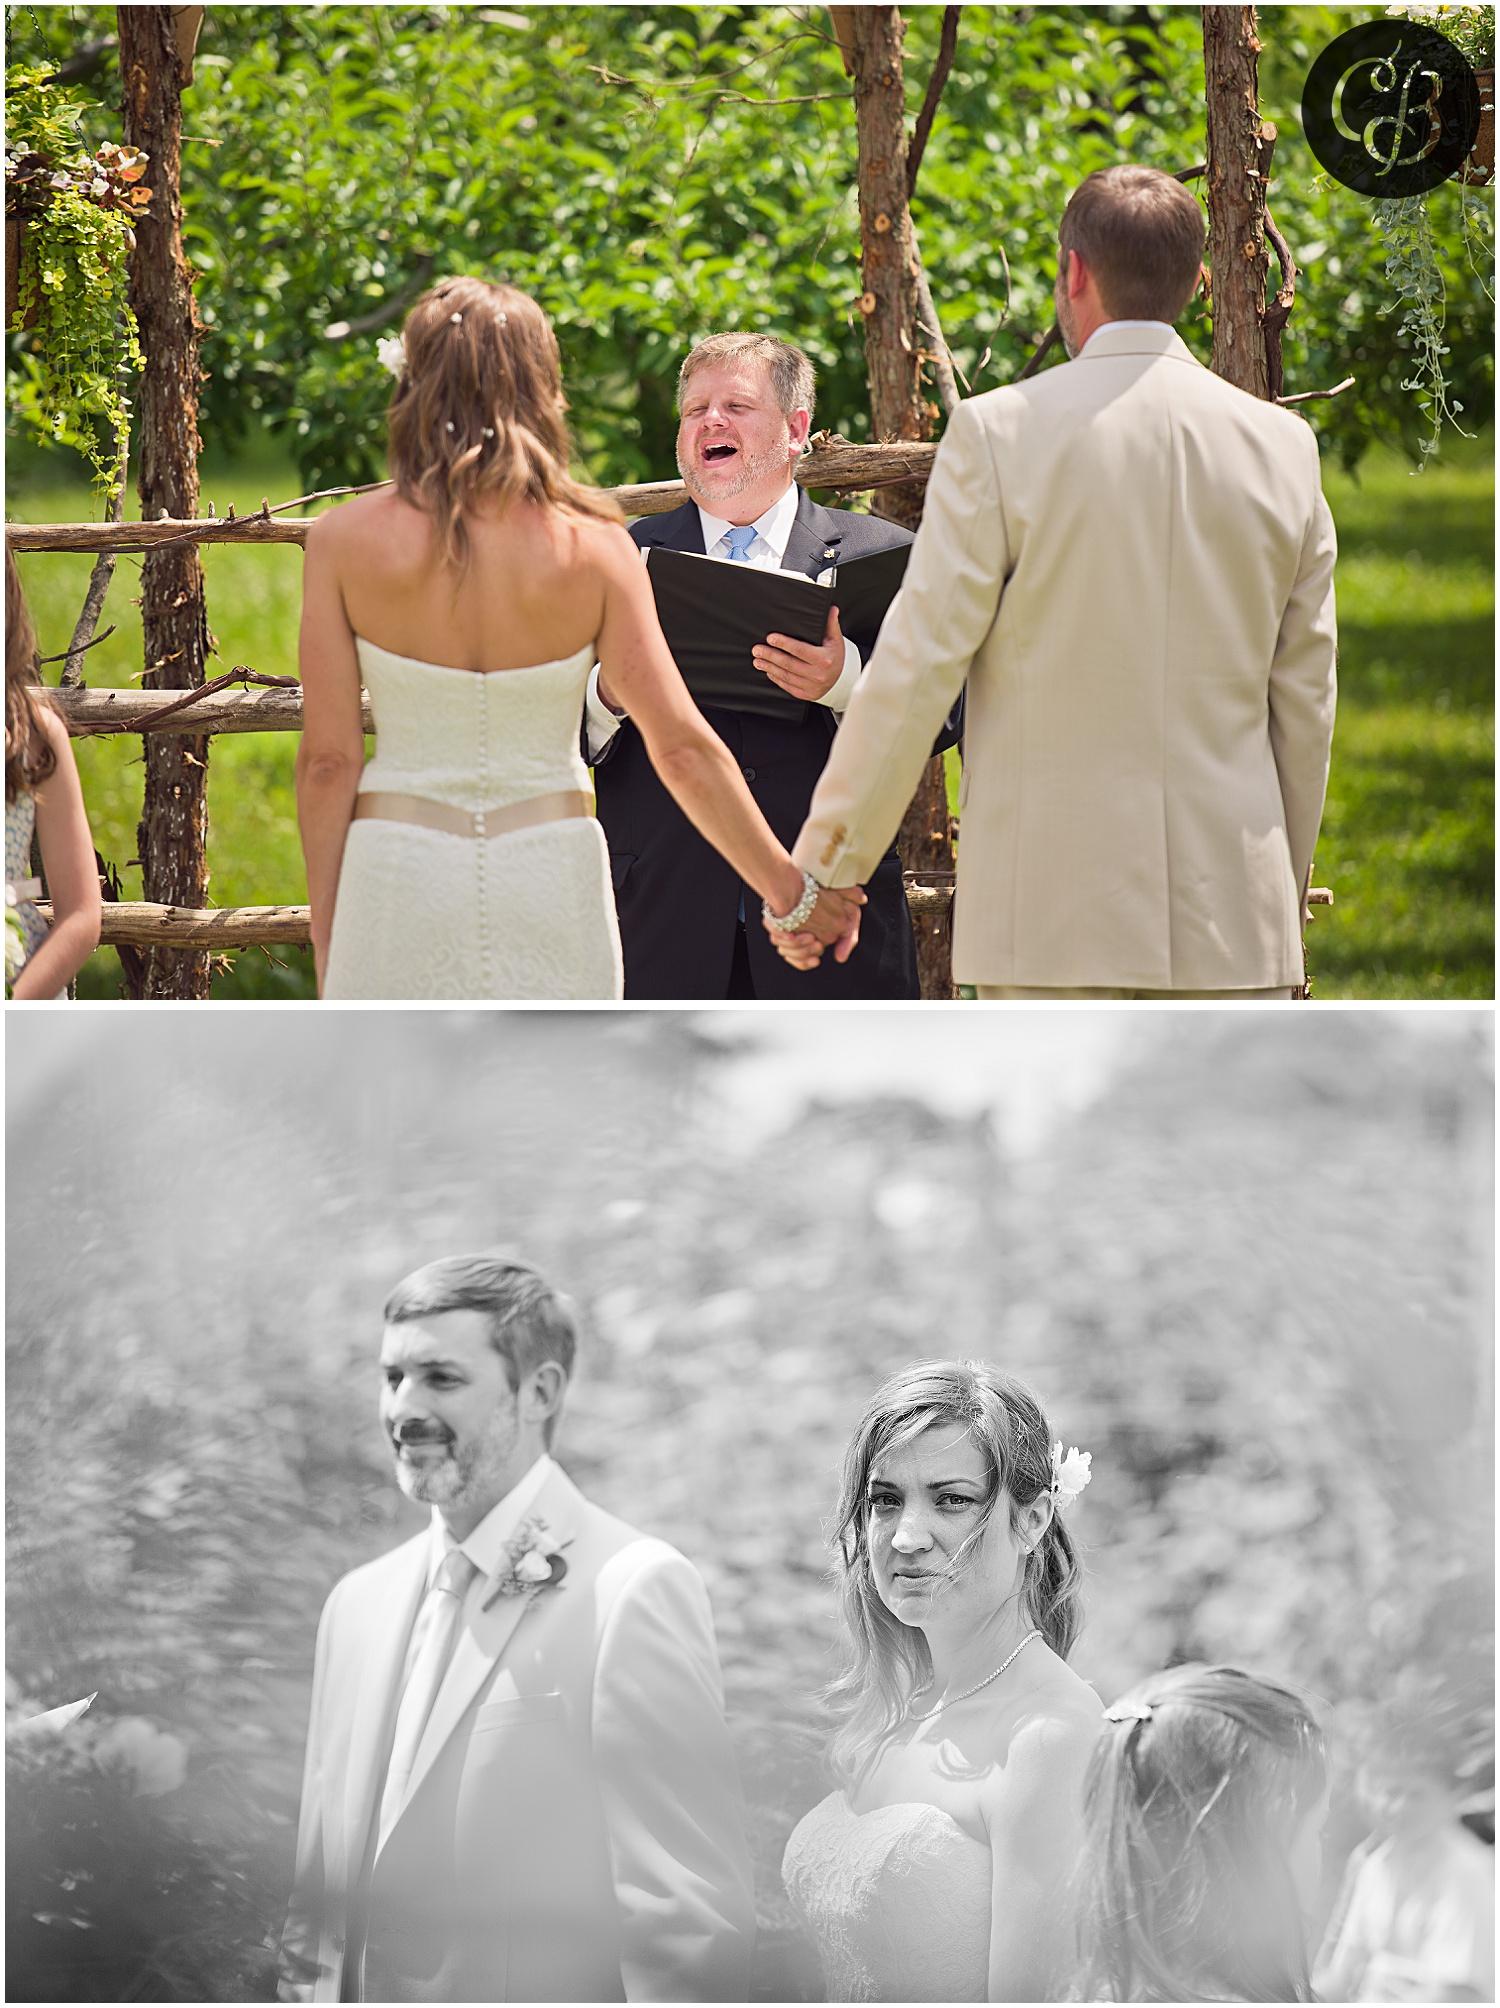 Sandhill-Crane-Winery-Wedding_0147.jpg